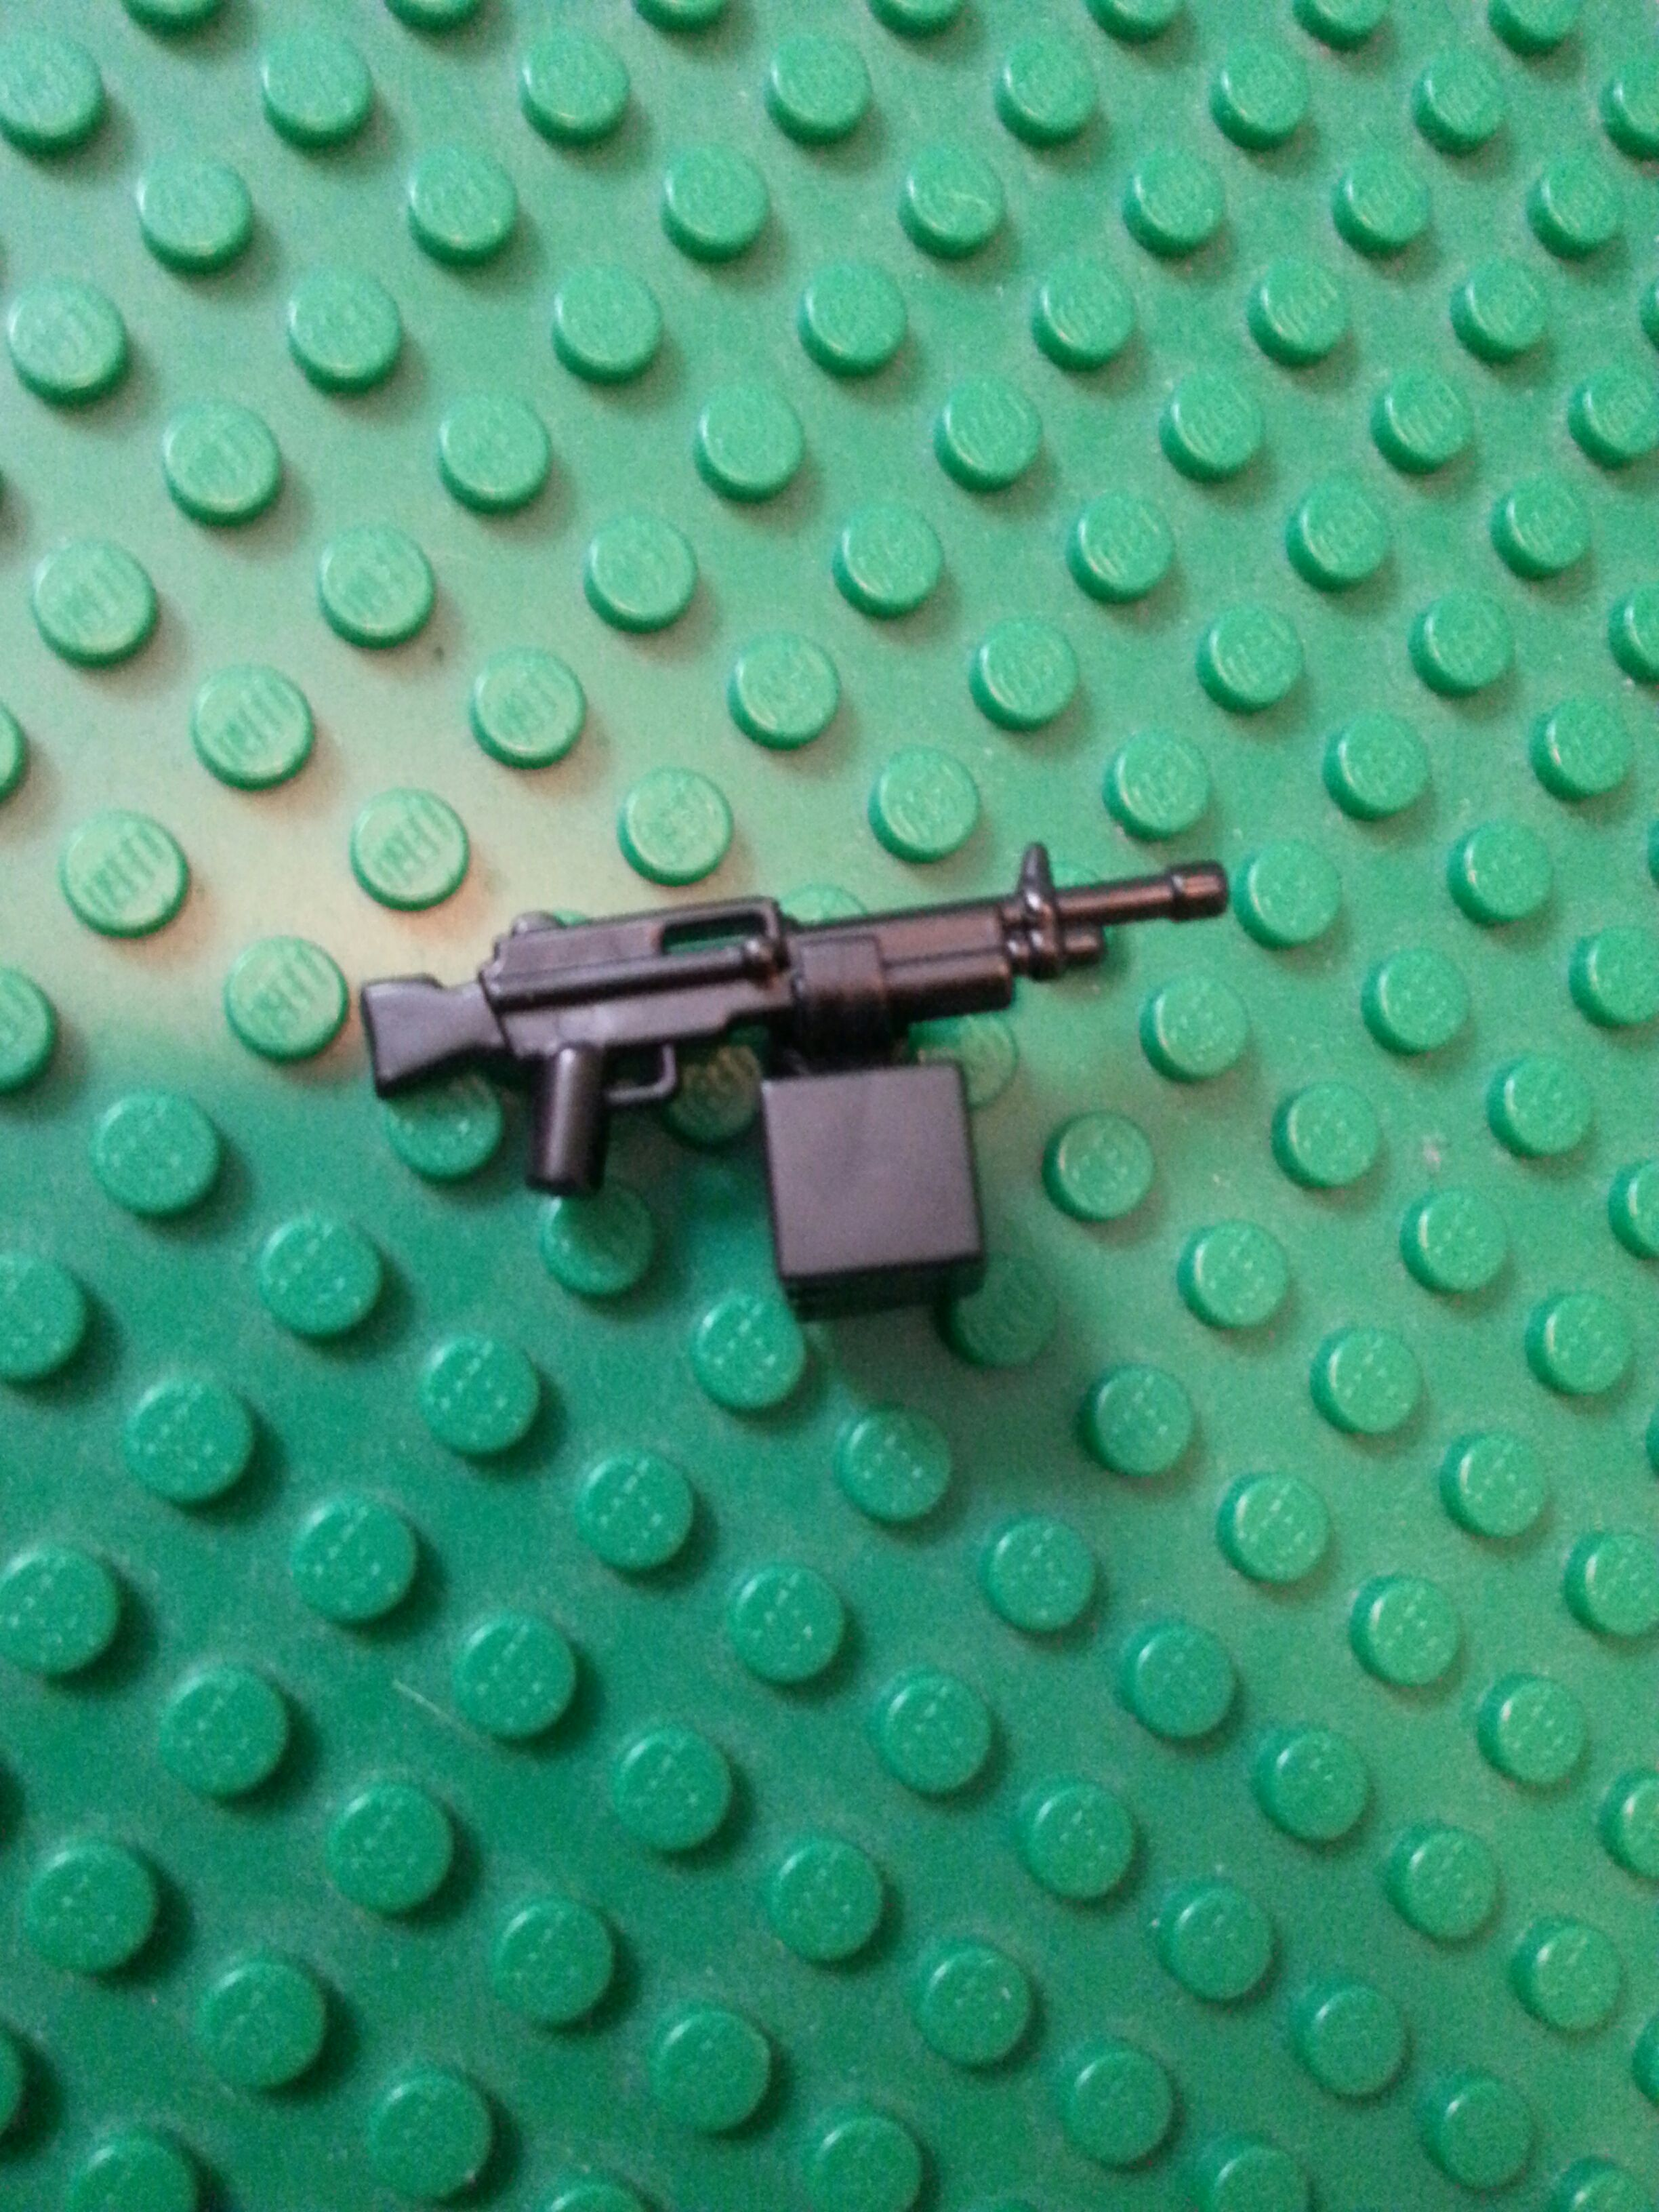 Picture of The LMG (light Machine Gun)